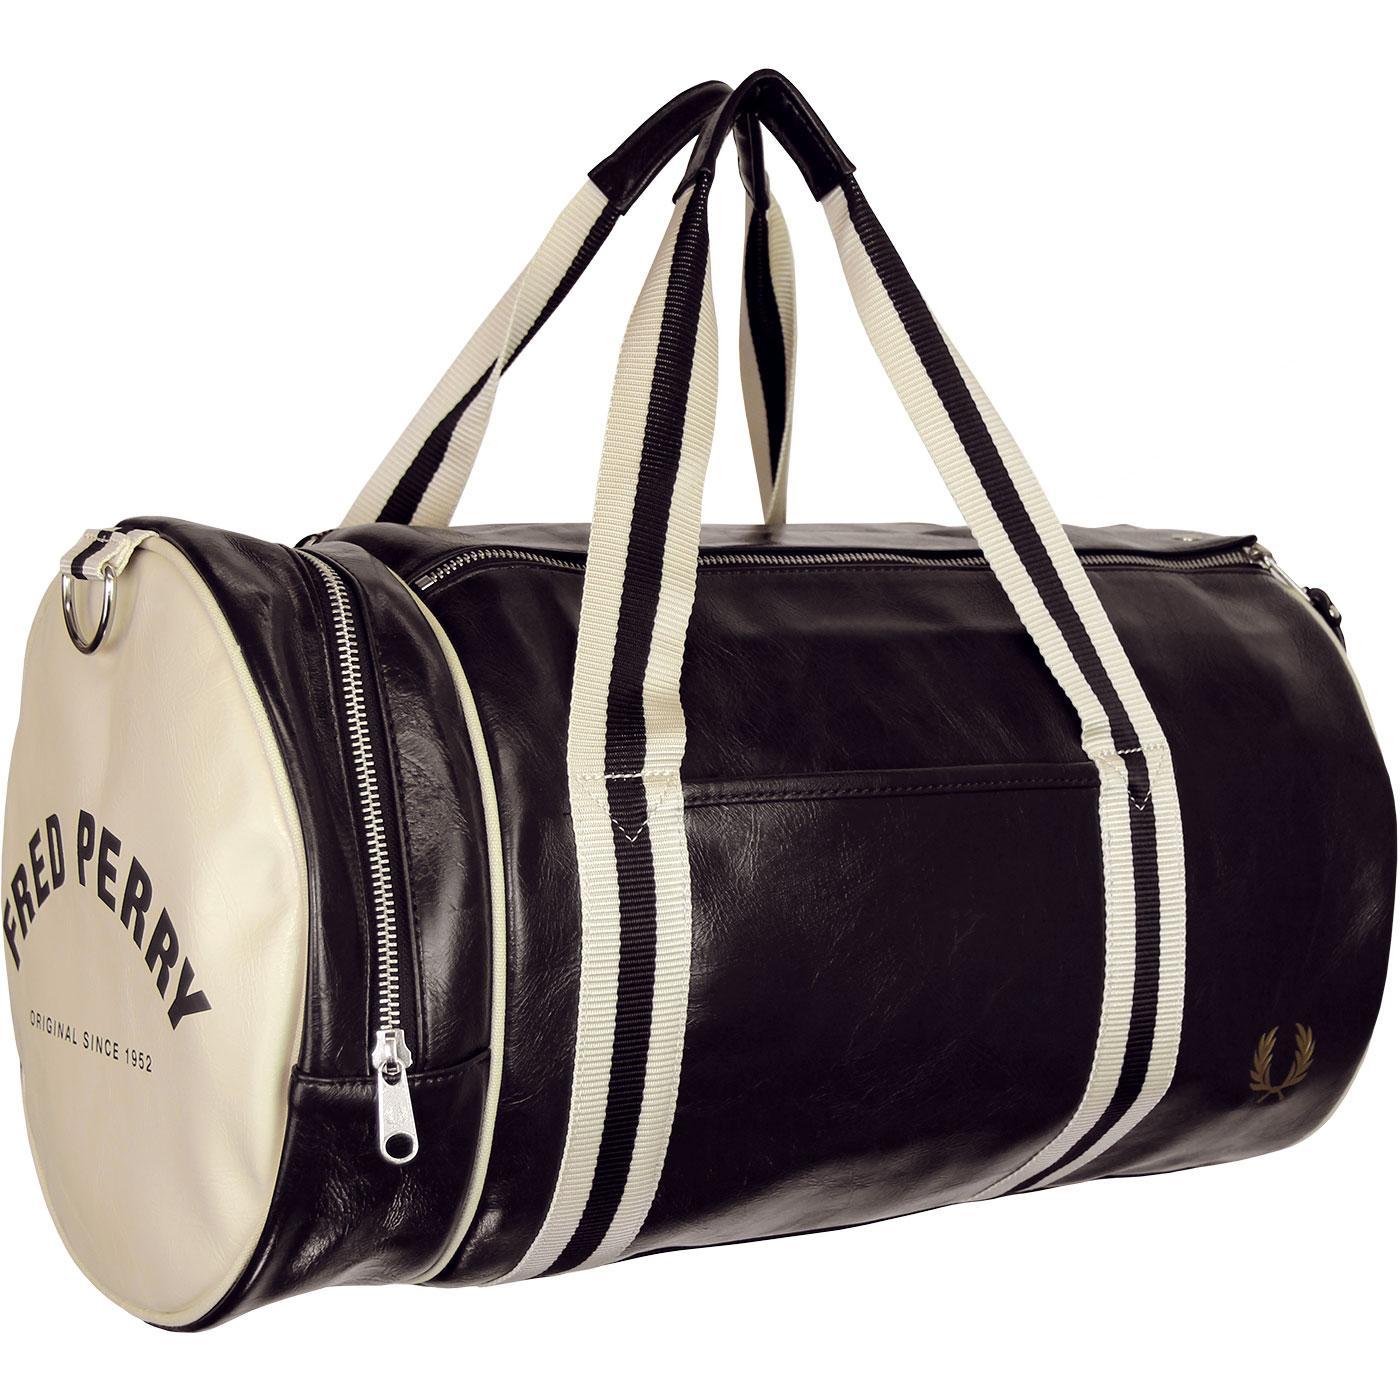 FRED PERRY Retro Classic Barrel Bag - Black